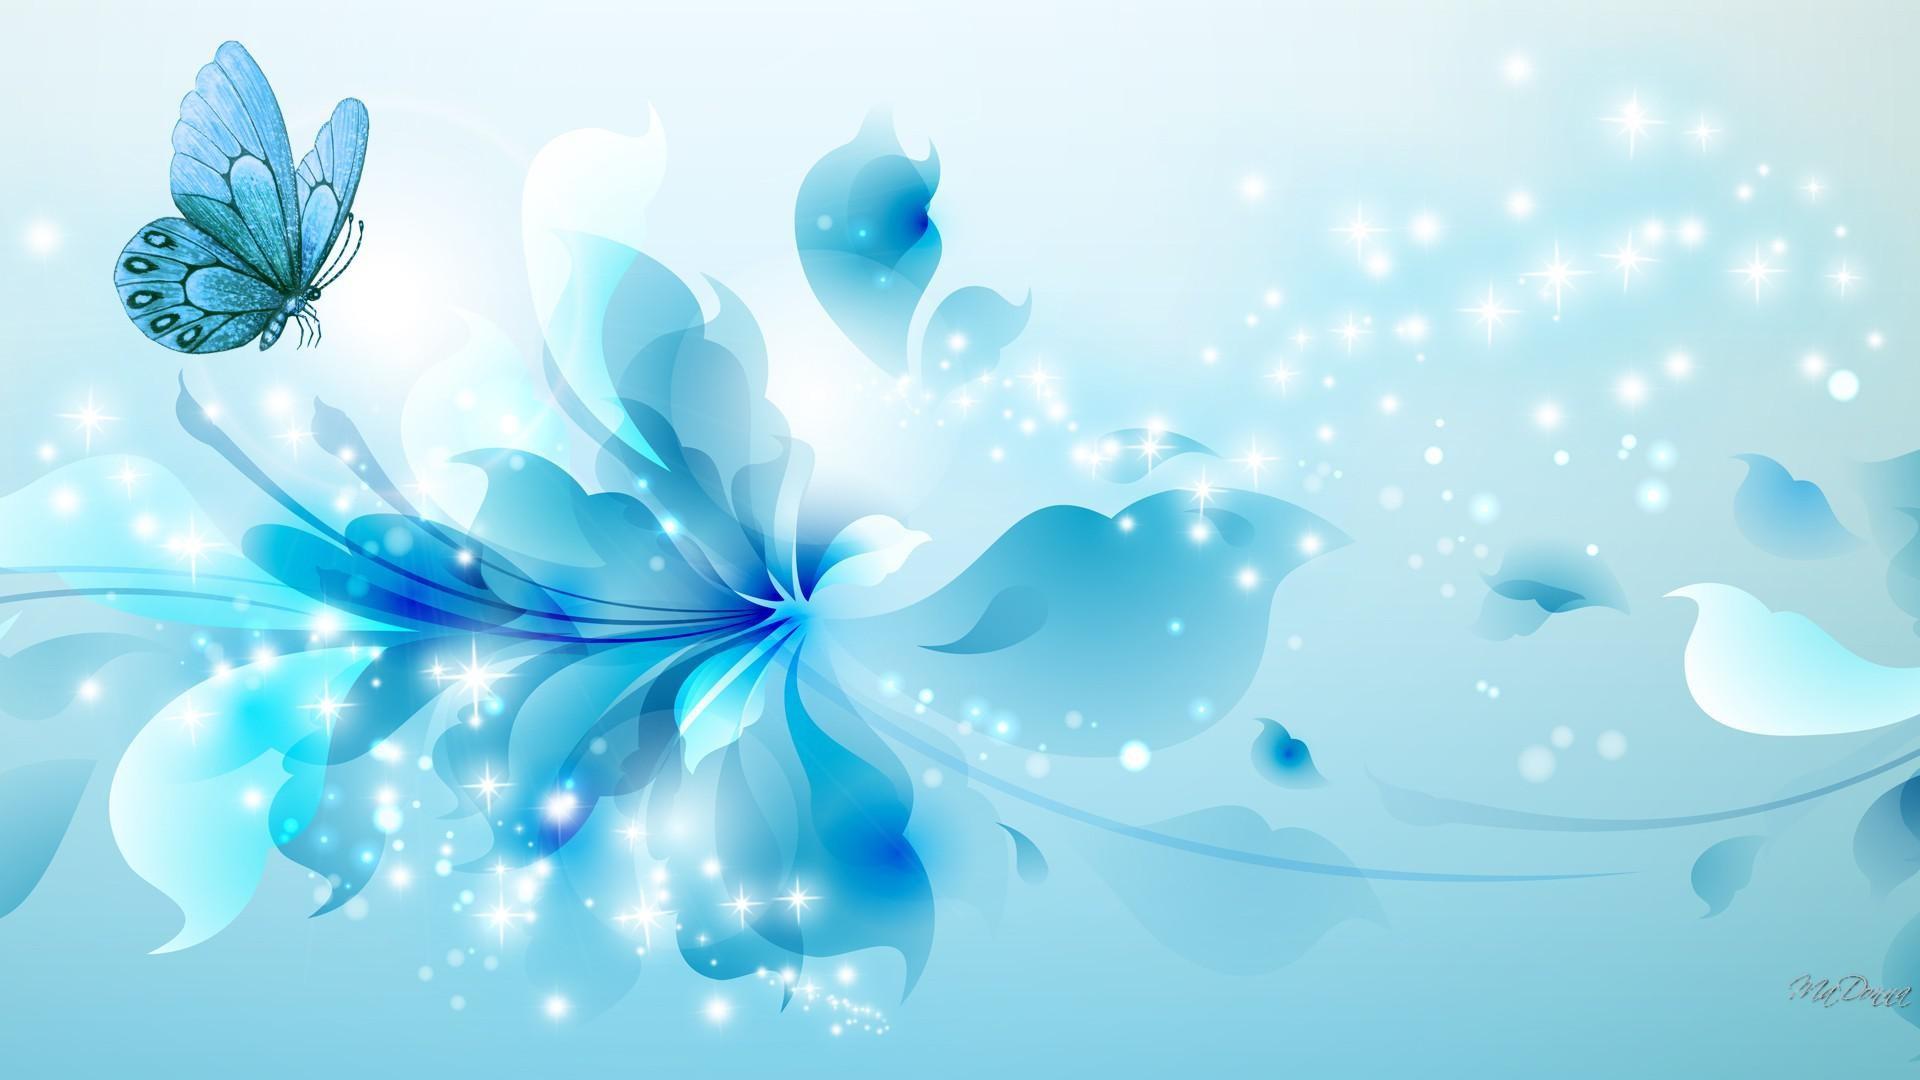 HD-aqua-blue-wallpaper-download.jpg (1920×1080) | blue flowers | Pinterest  | Wallpaper and Photo manipulation